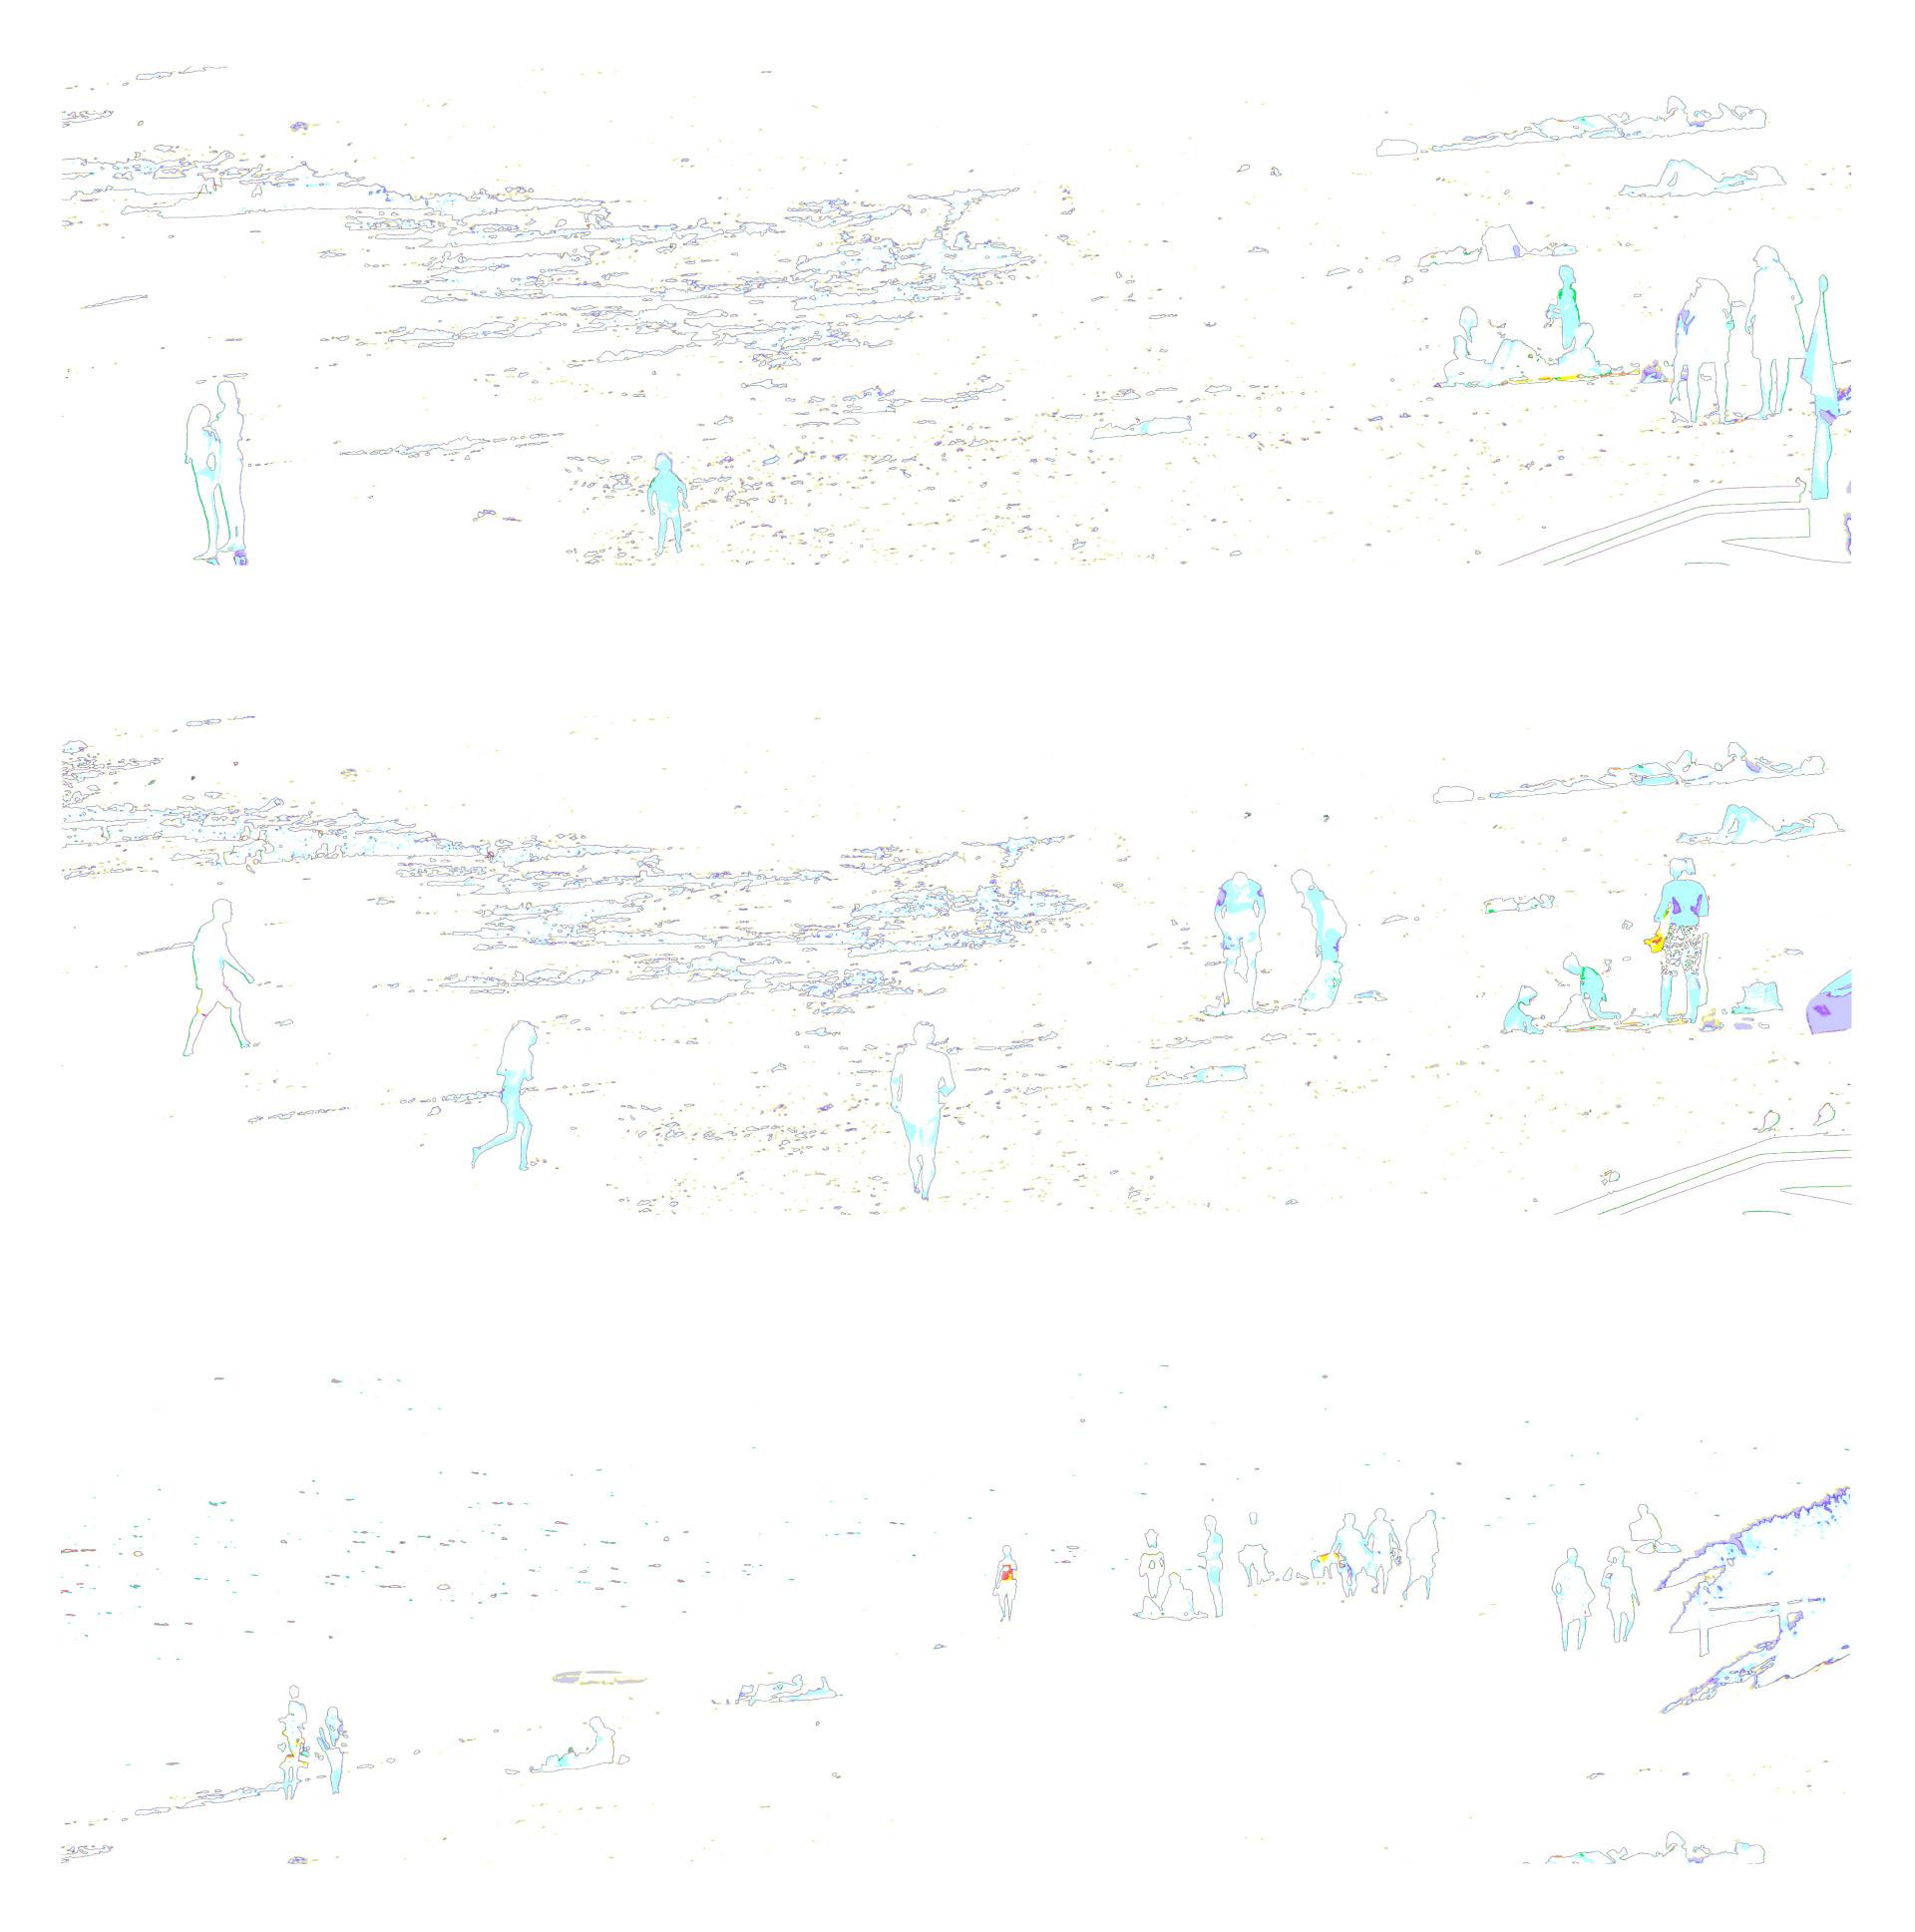 A Line Between - Joseph Strid